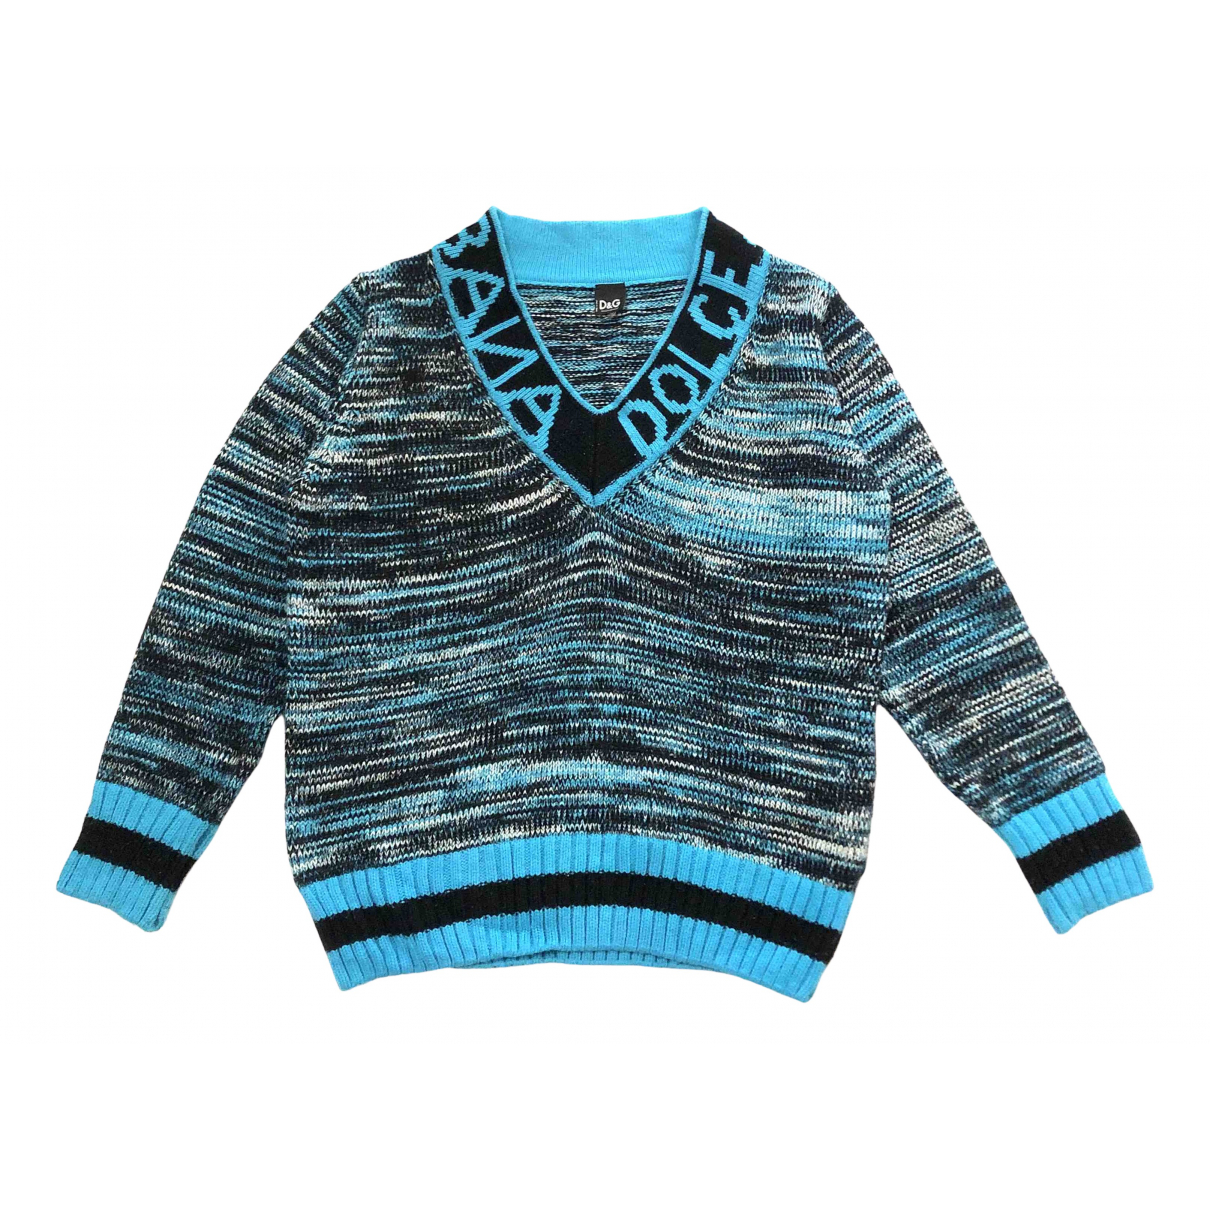 D&g \N Pullover in  Blau Wolle